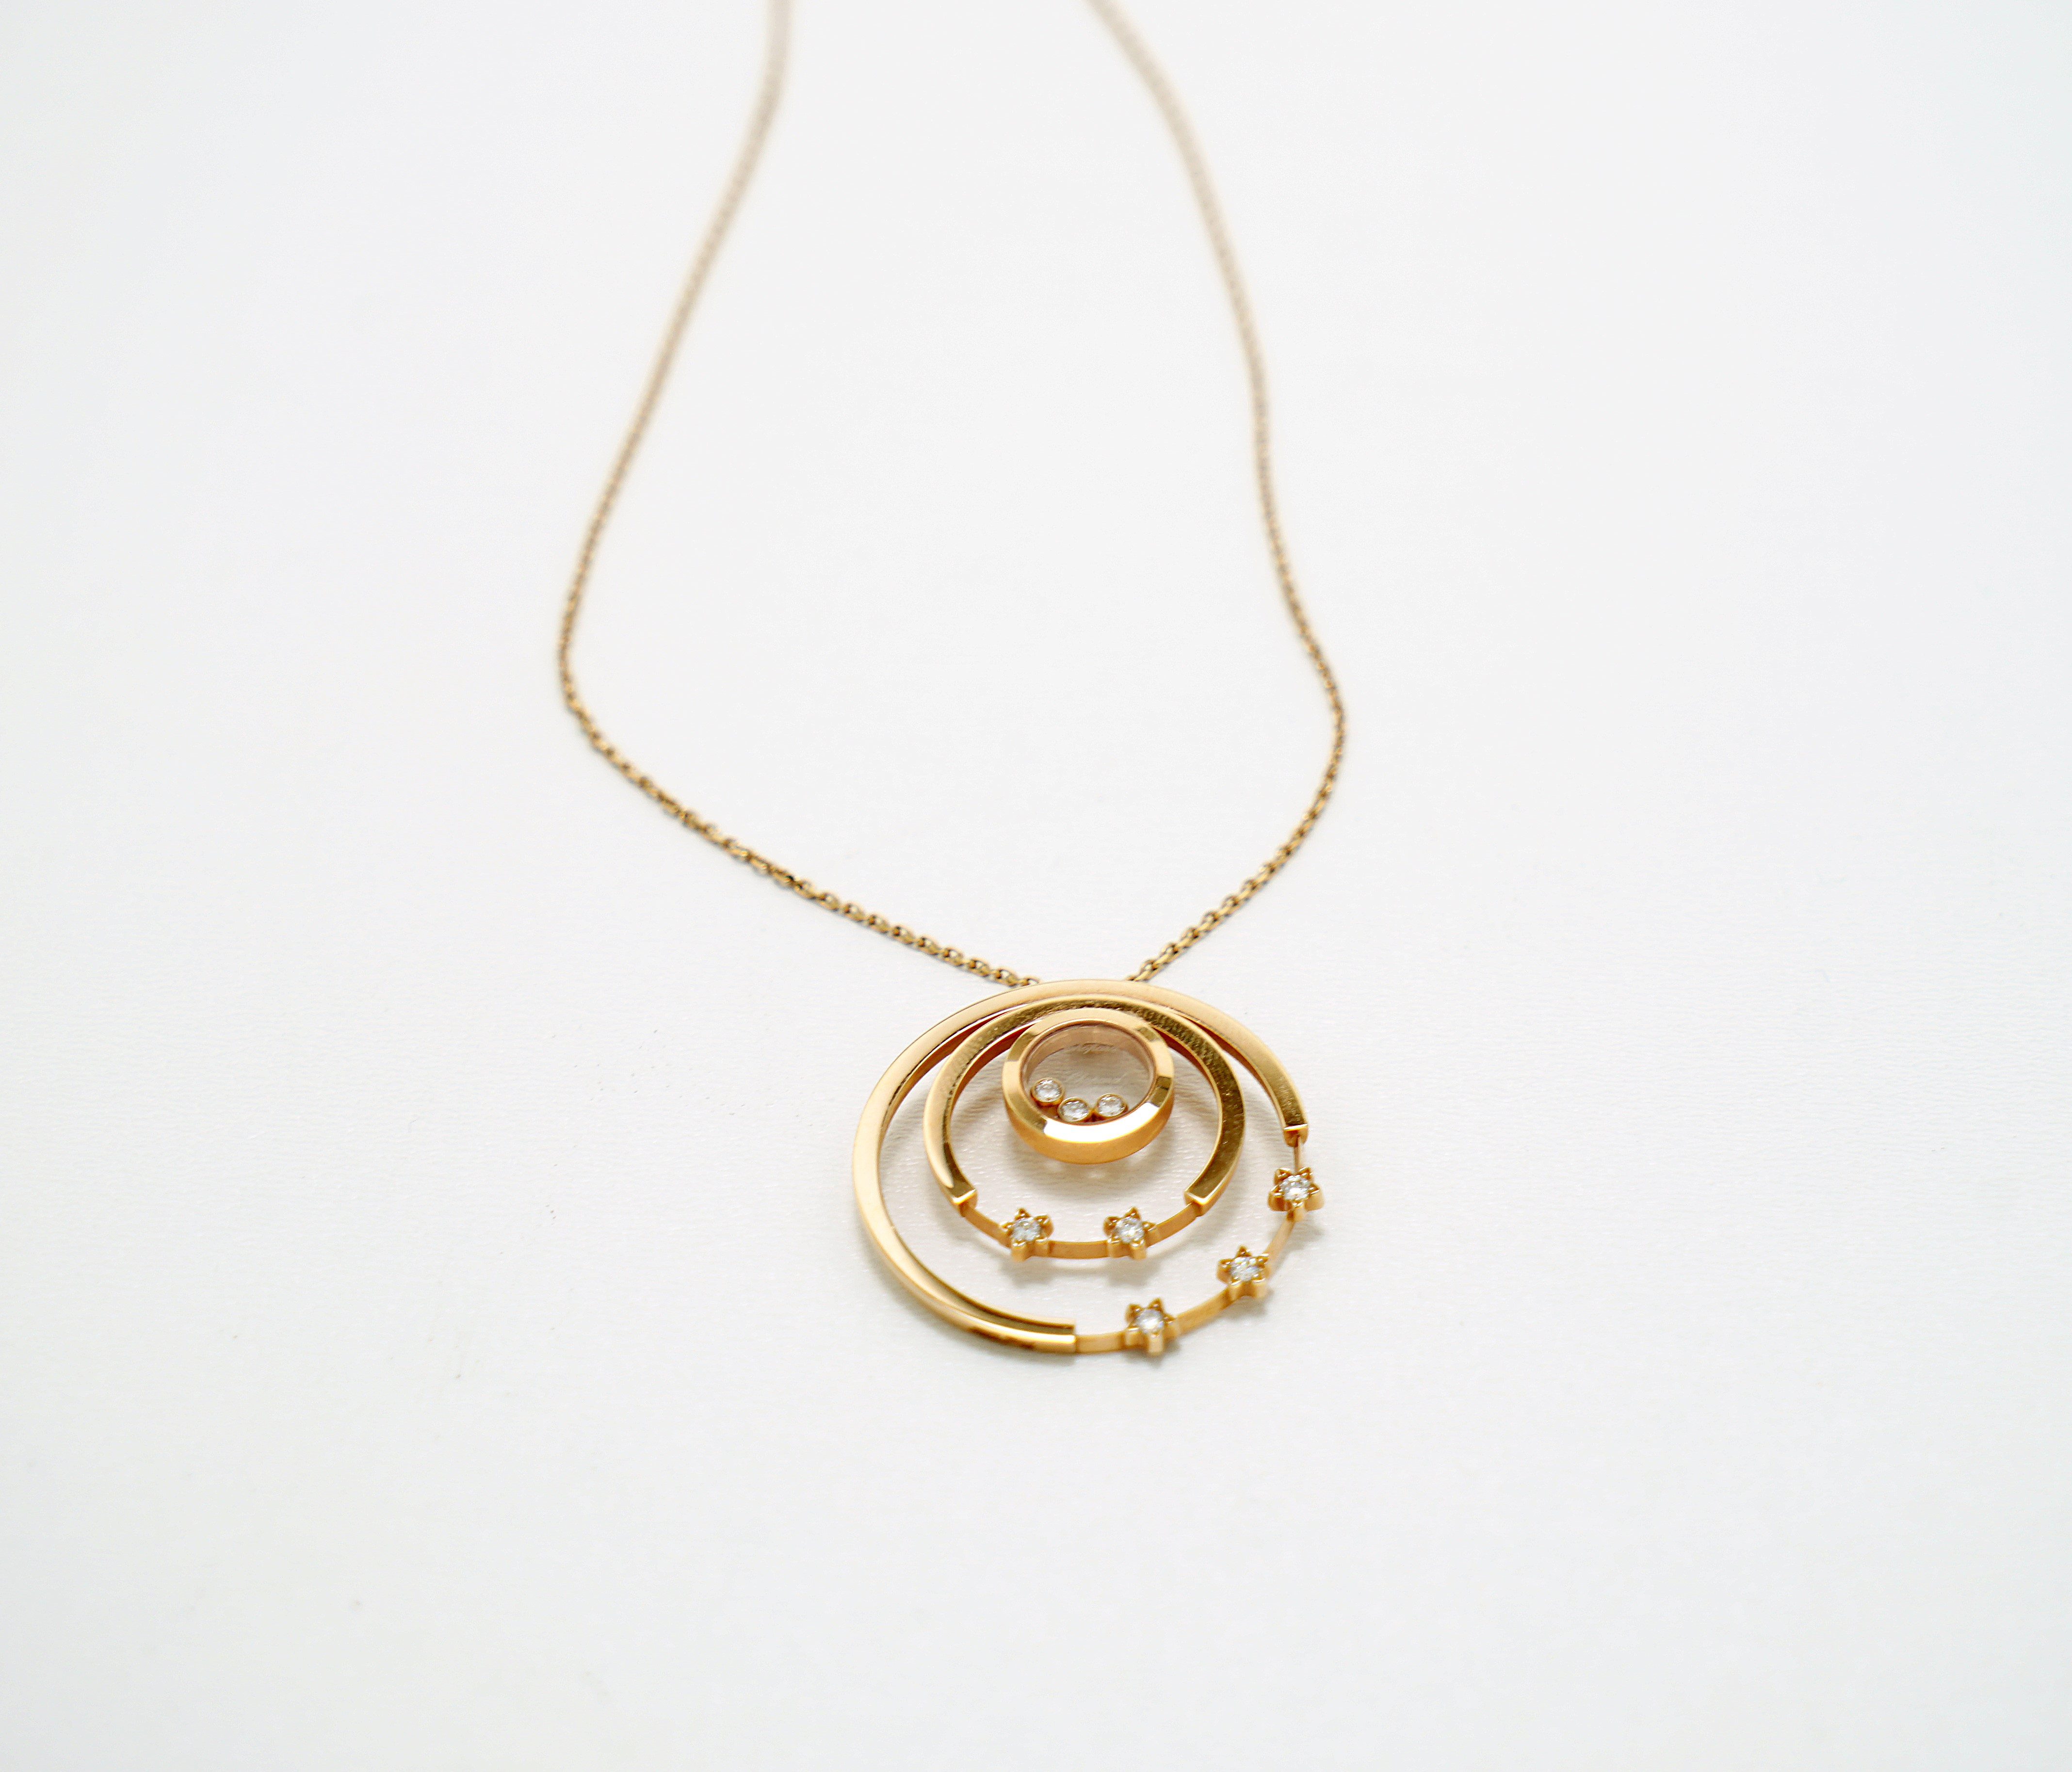 A Lady's Chopard 18K Rose Gold , Happy Diamonds pendant - Image 7 of 9